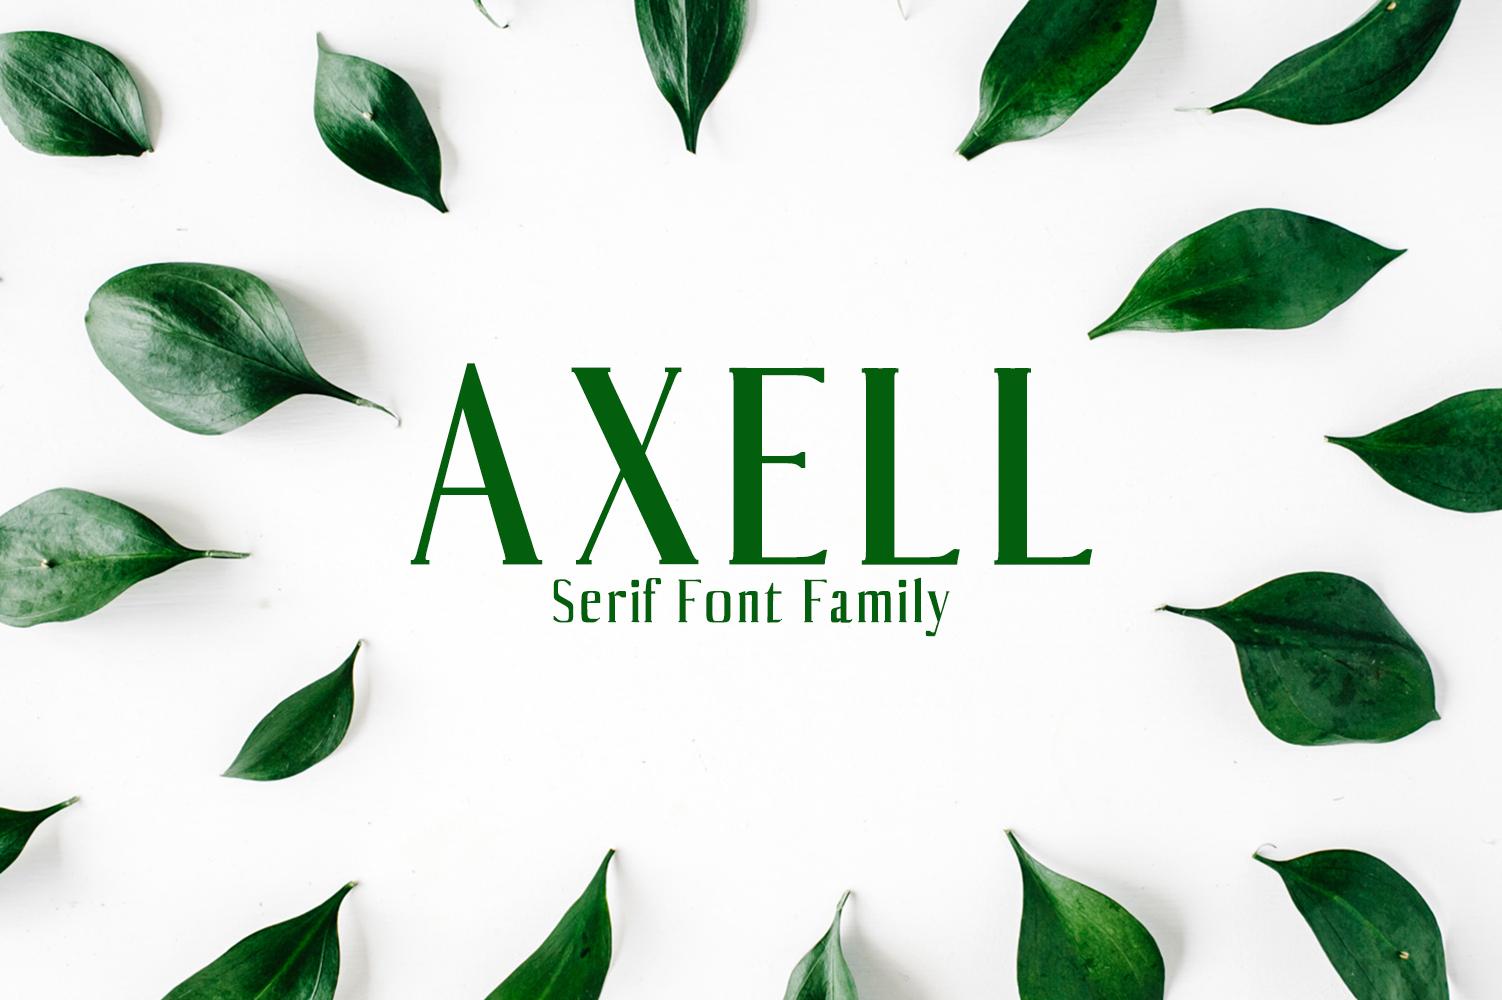 Axell Serif Font Family example image 1